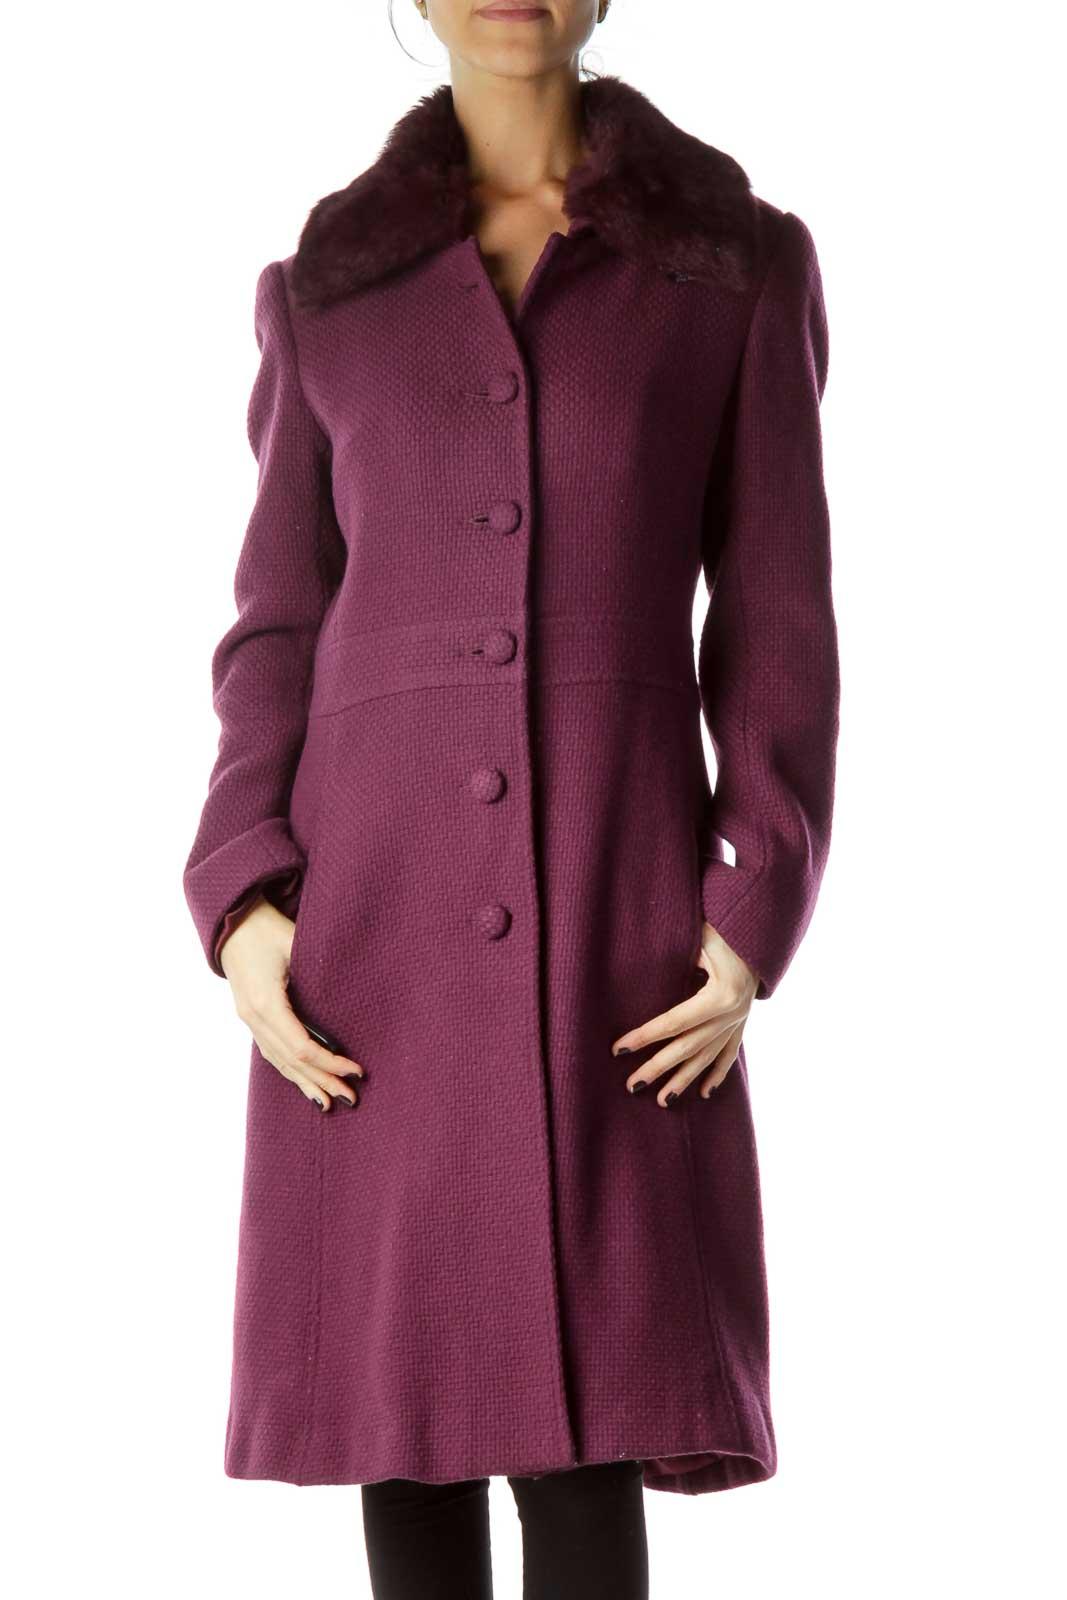 Purple Faux-Fur Collar Single Breast Coat Front